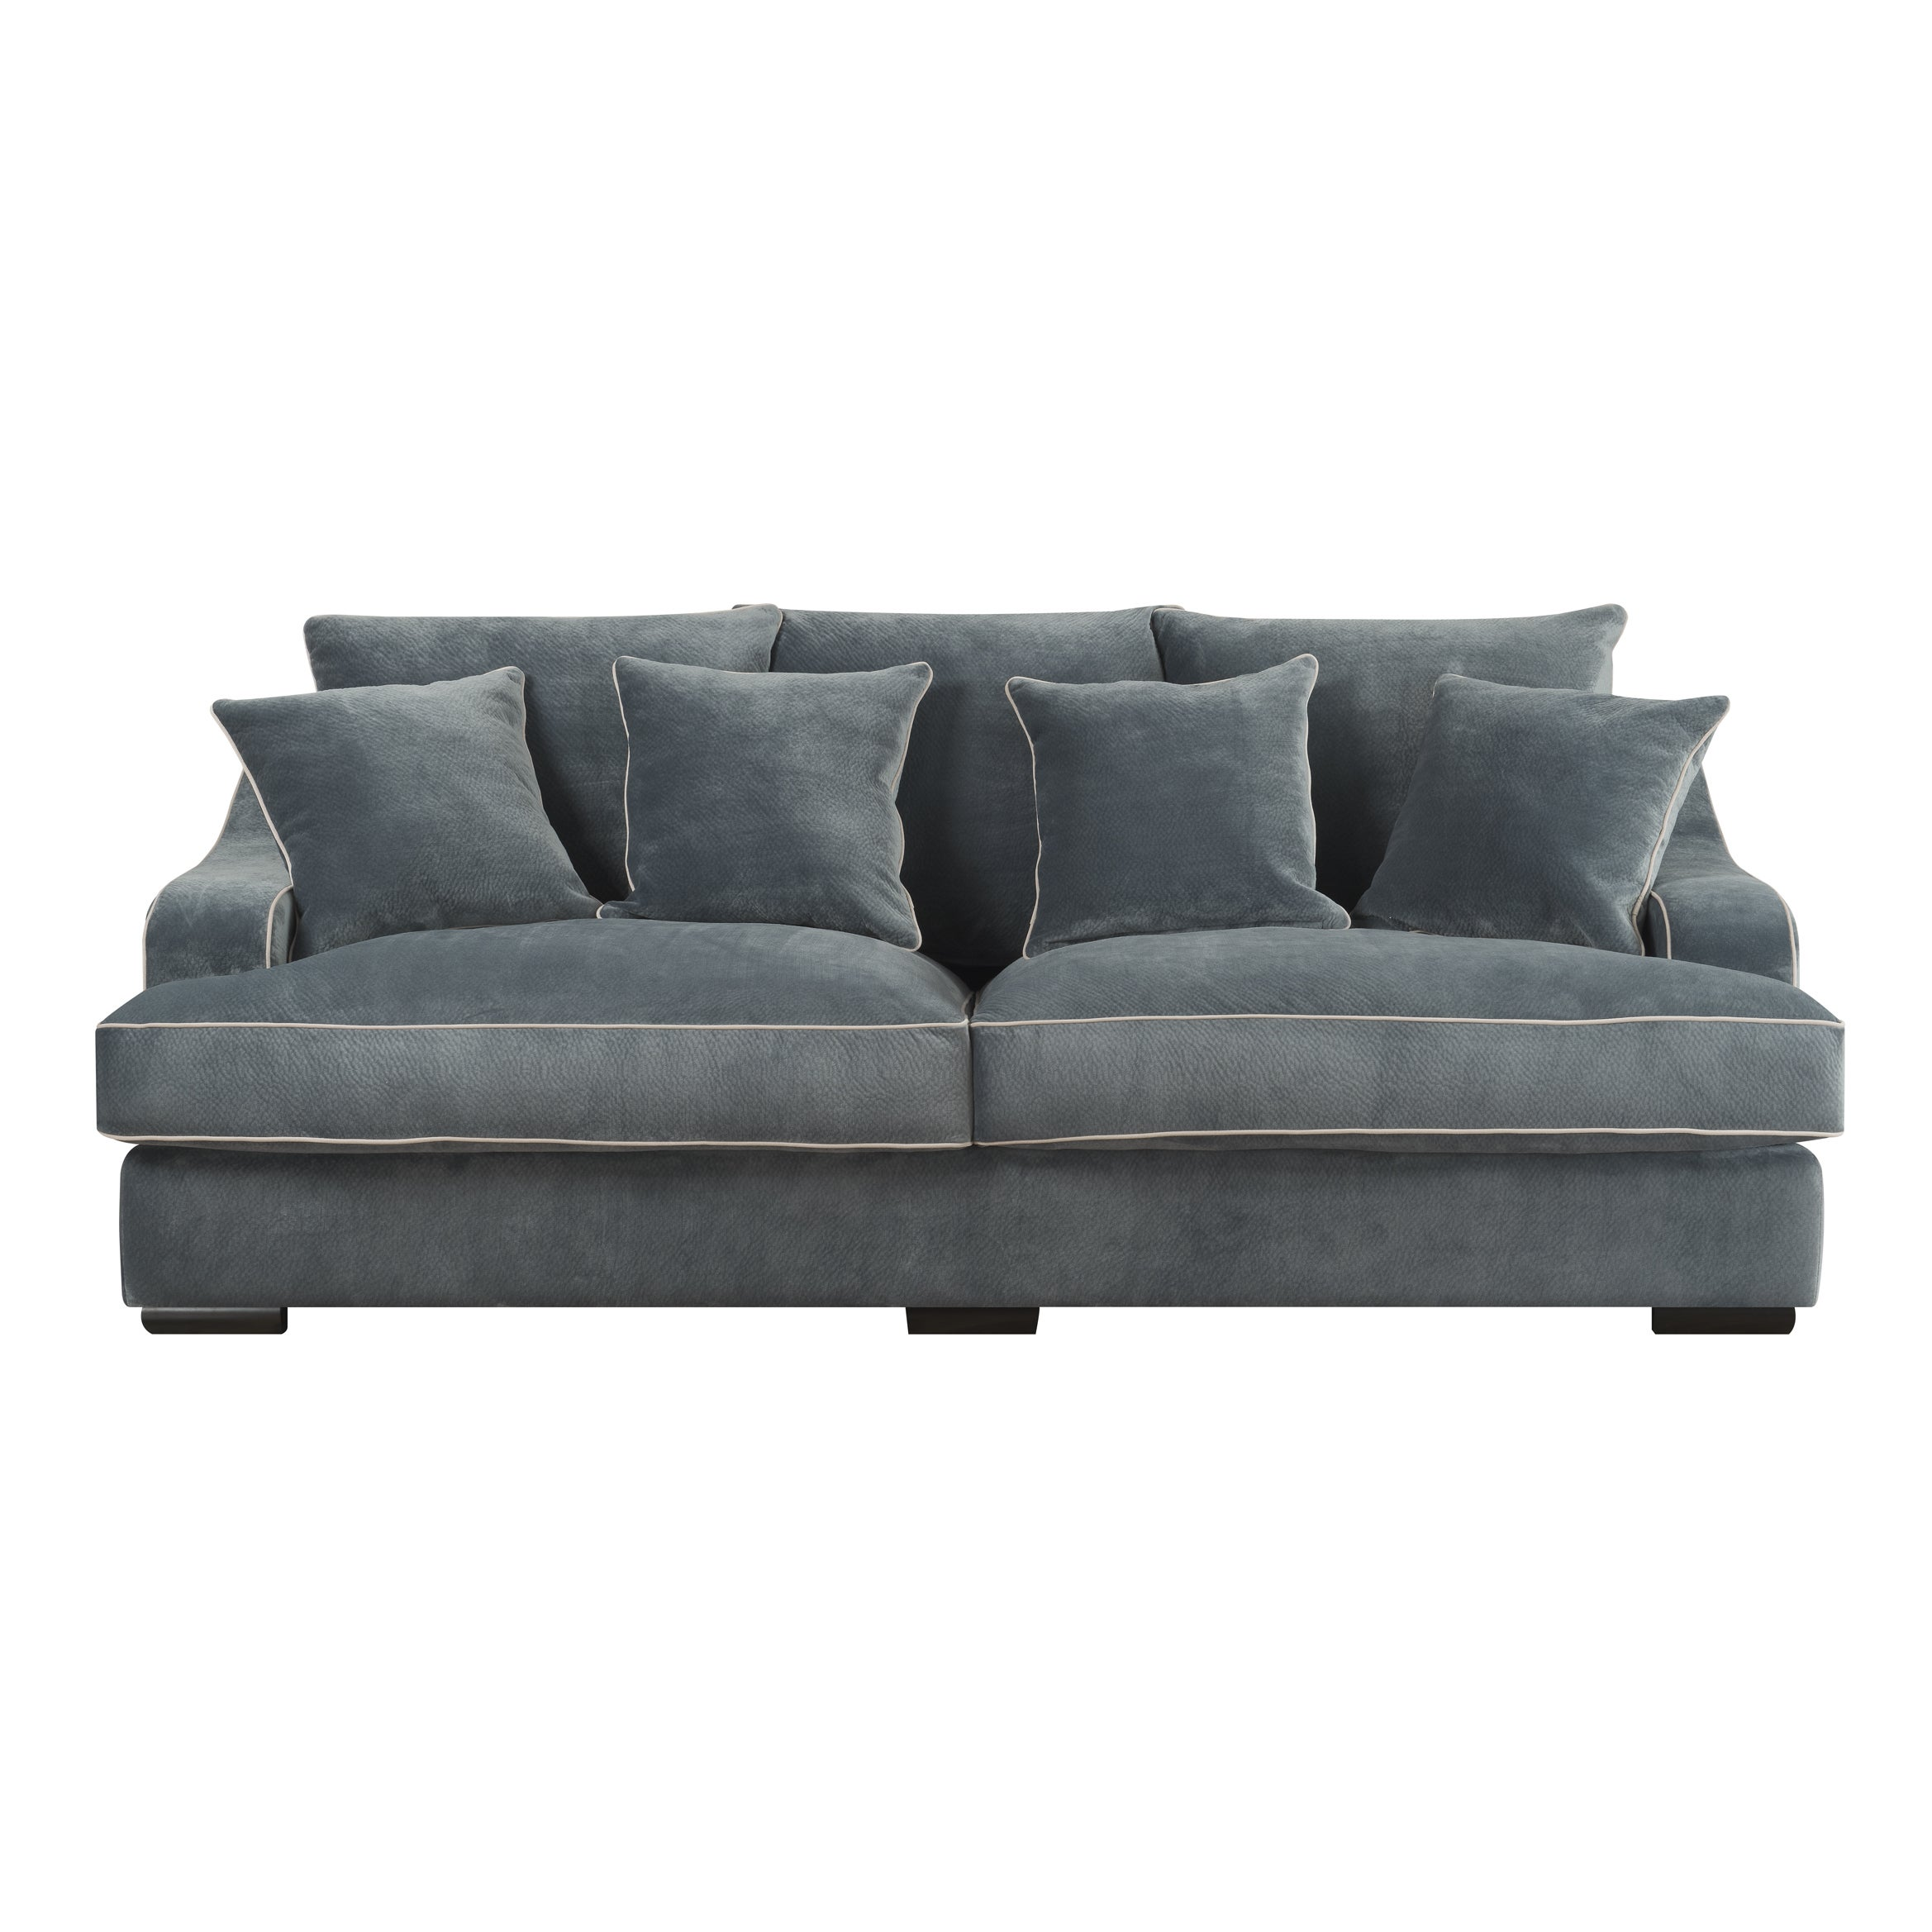 Shop Emerald Caresse Marine Blue Plush Oversized Sofa   Free Shipping Today    Overstock.com   12806152